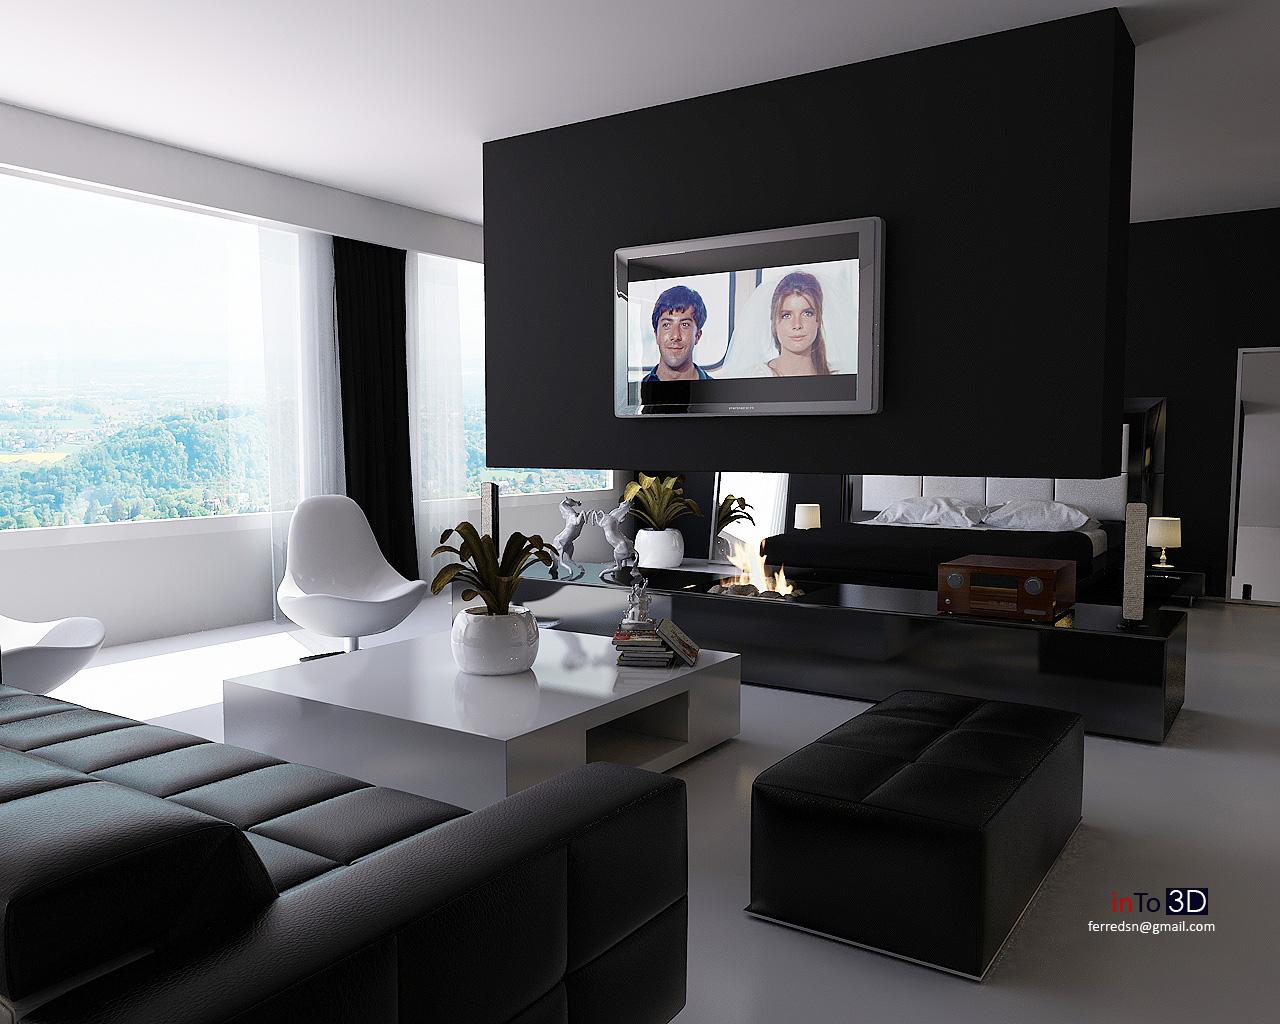 Freelance infoarquitectura e interiorismo - Fotos de interiorismo ...